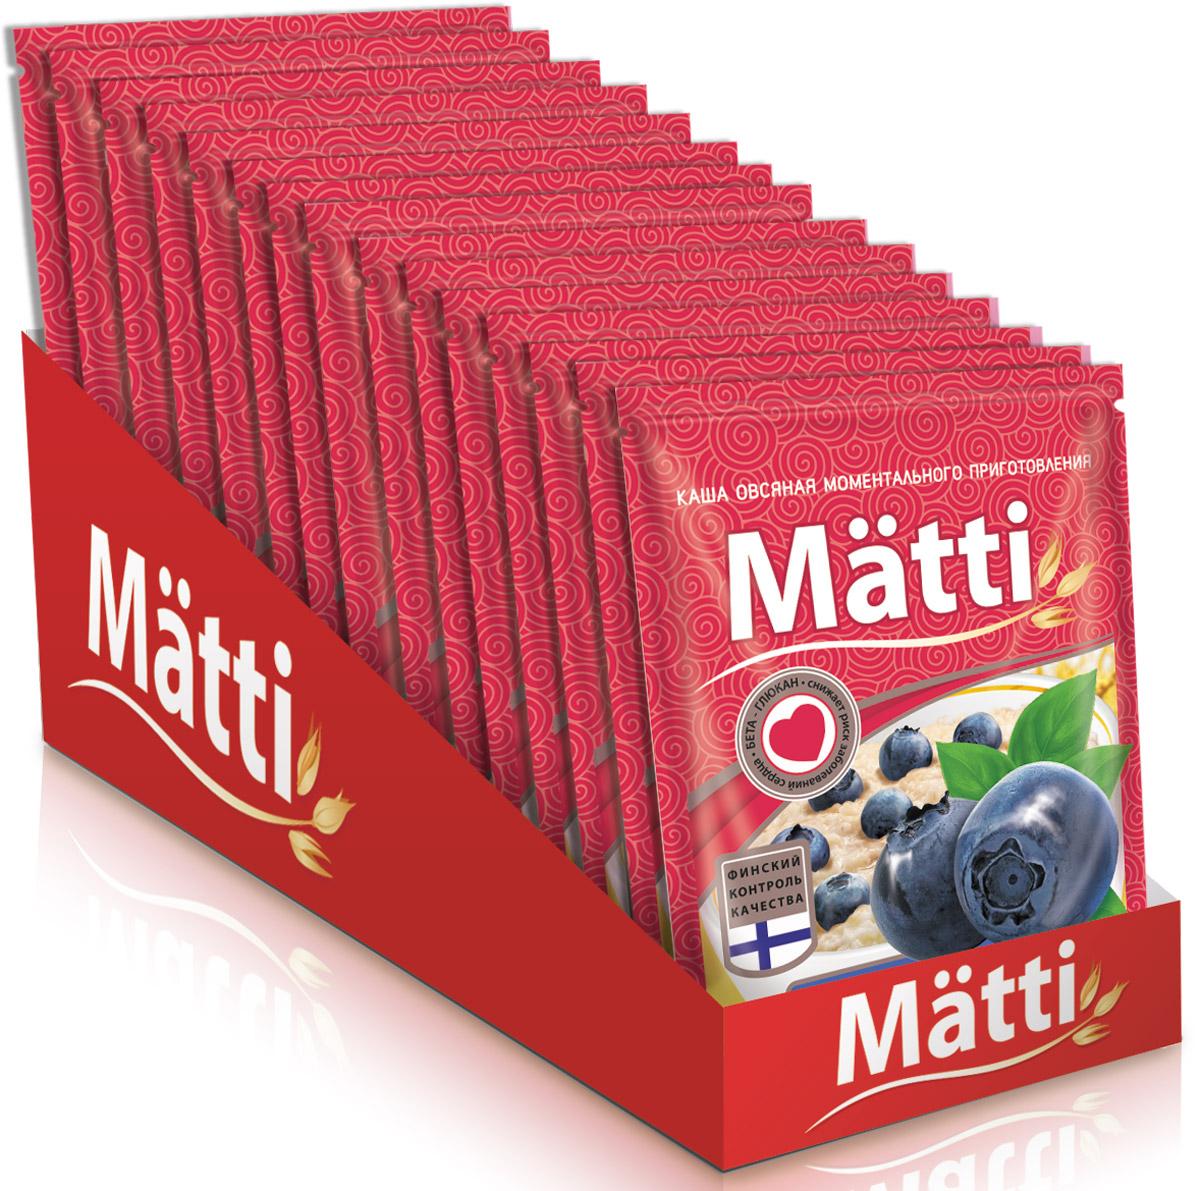 Matti каша с черникой, 15 шт по 40 г matti каша малина со сливками 15 шт по 40 г